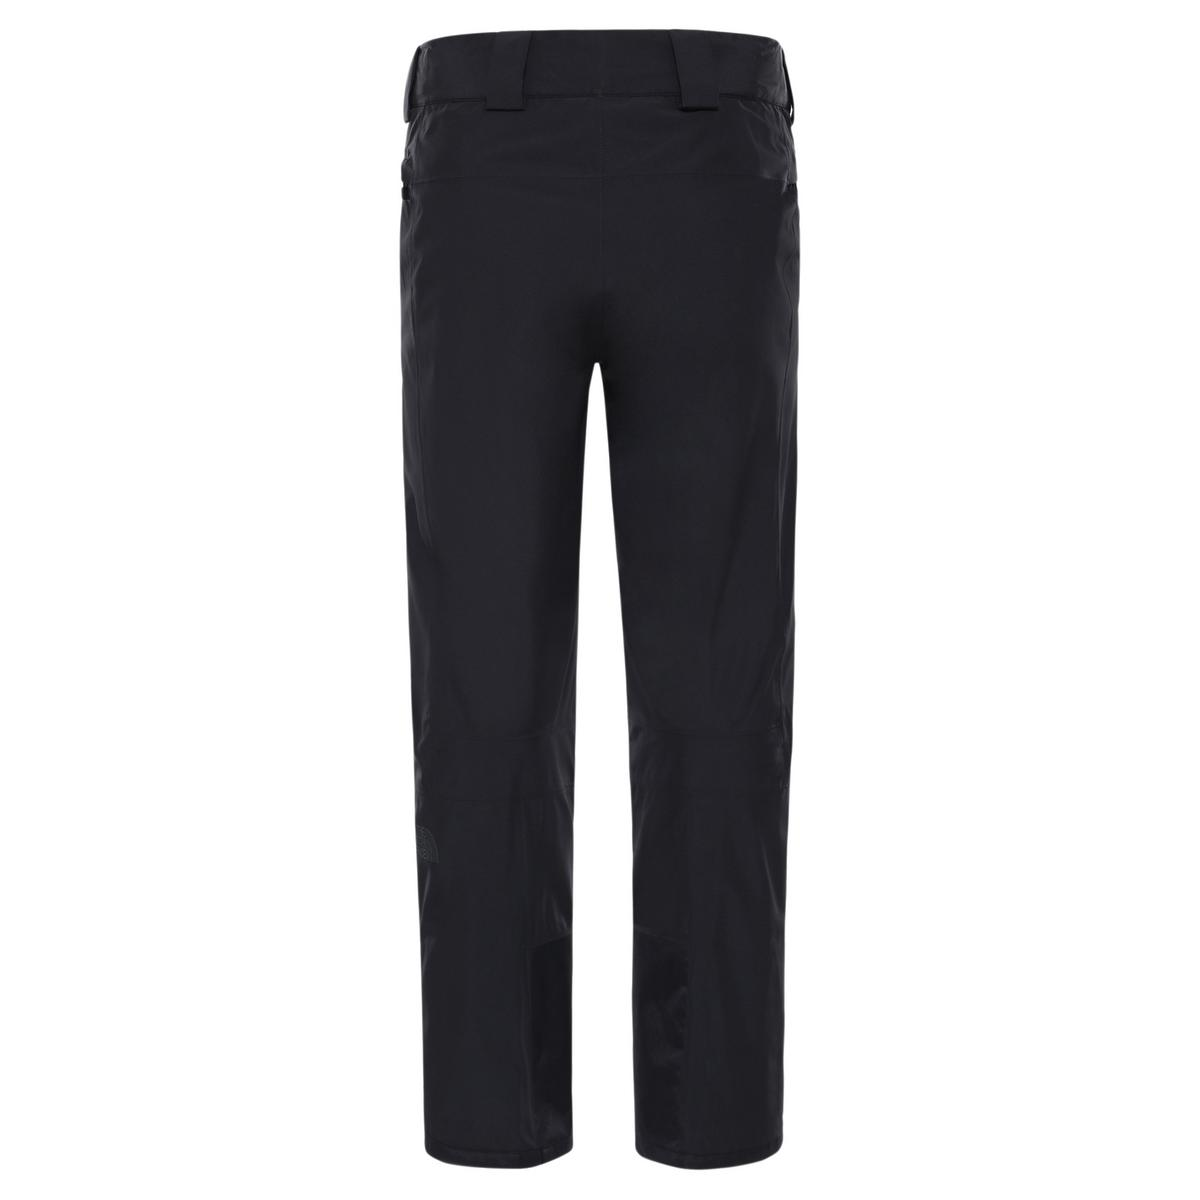 The North Face Men's Presena Pant - Black